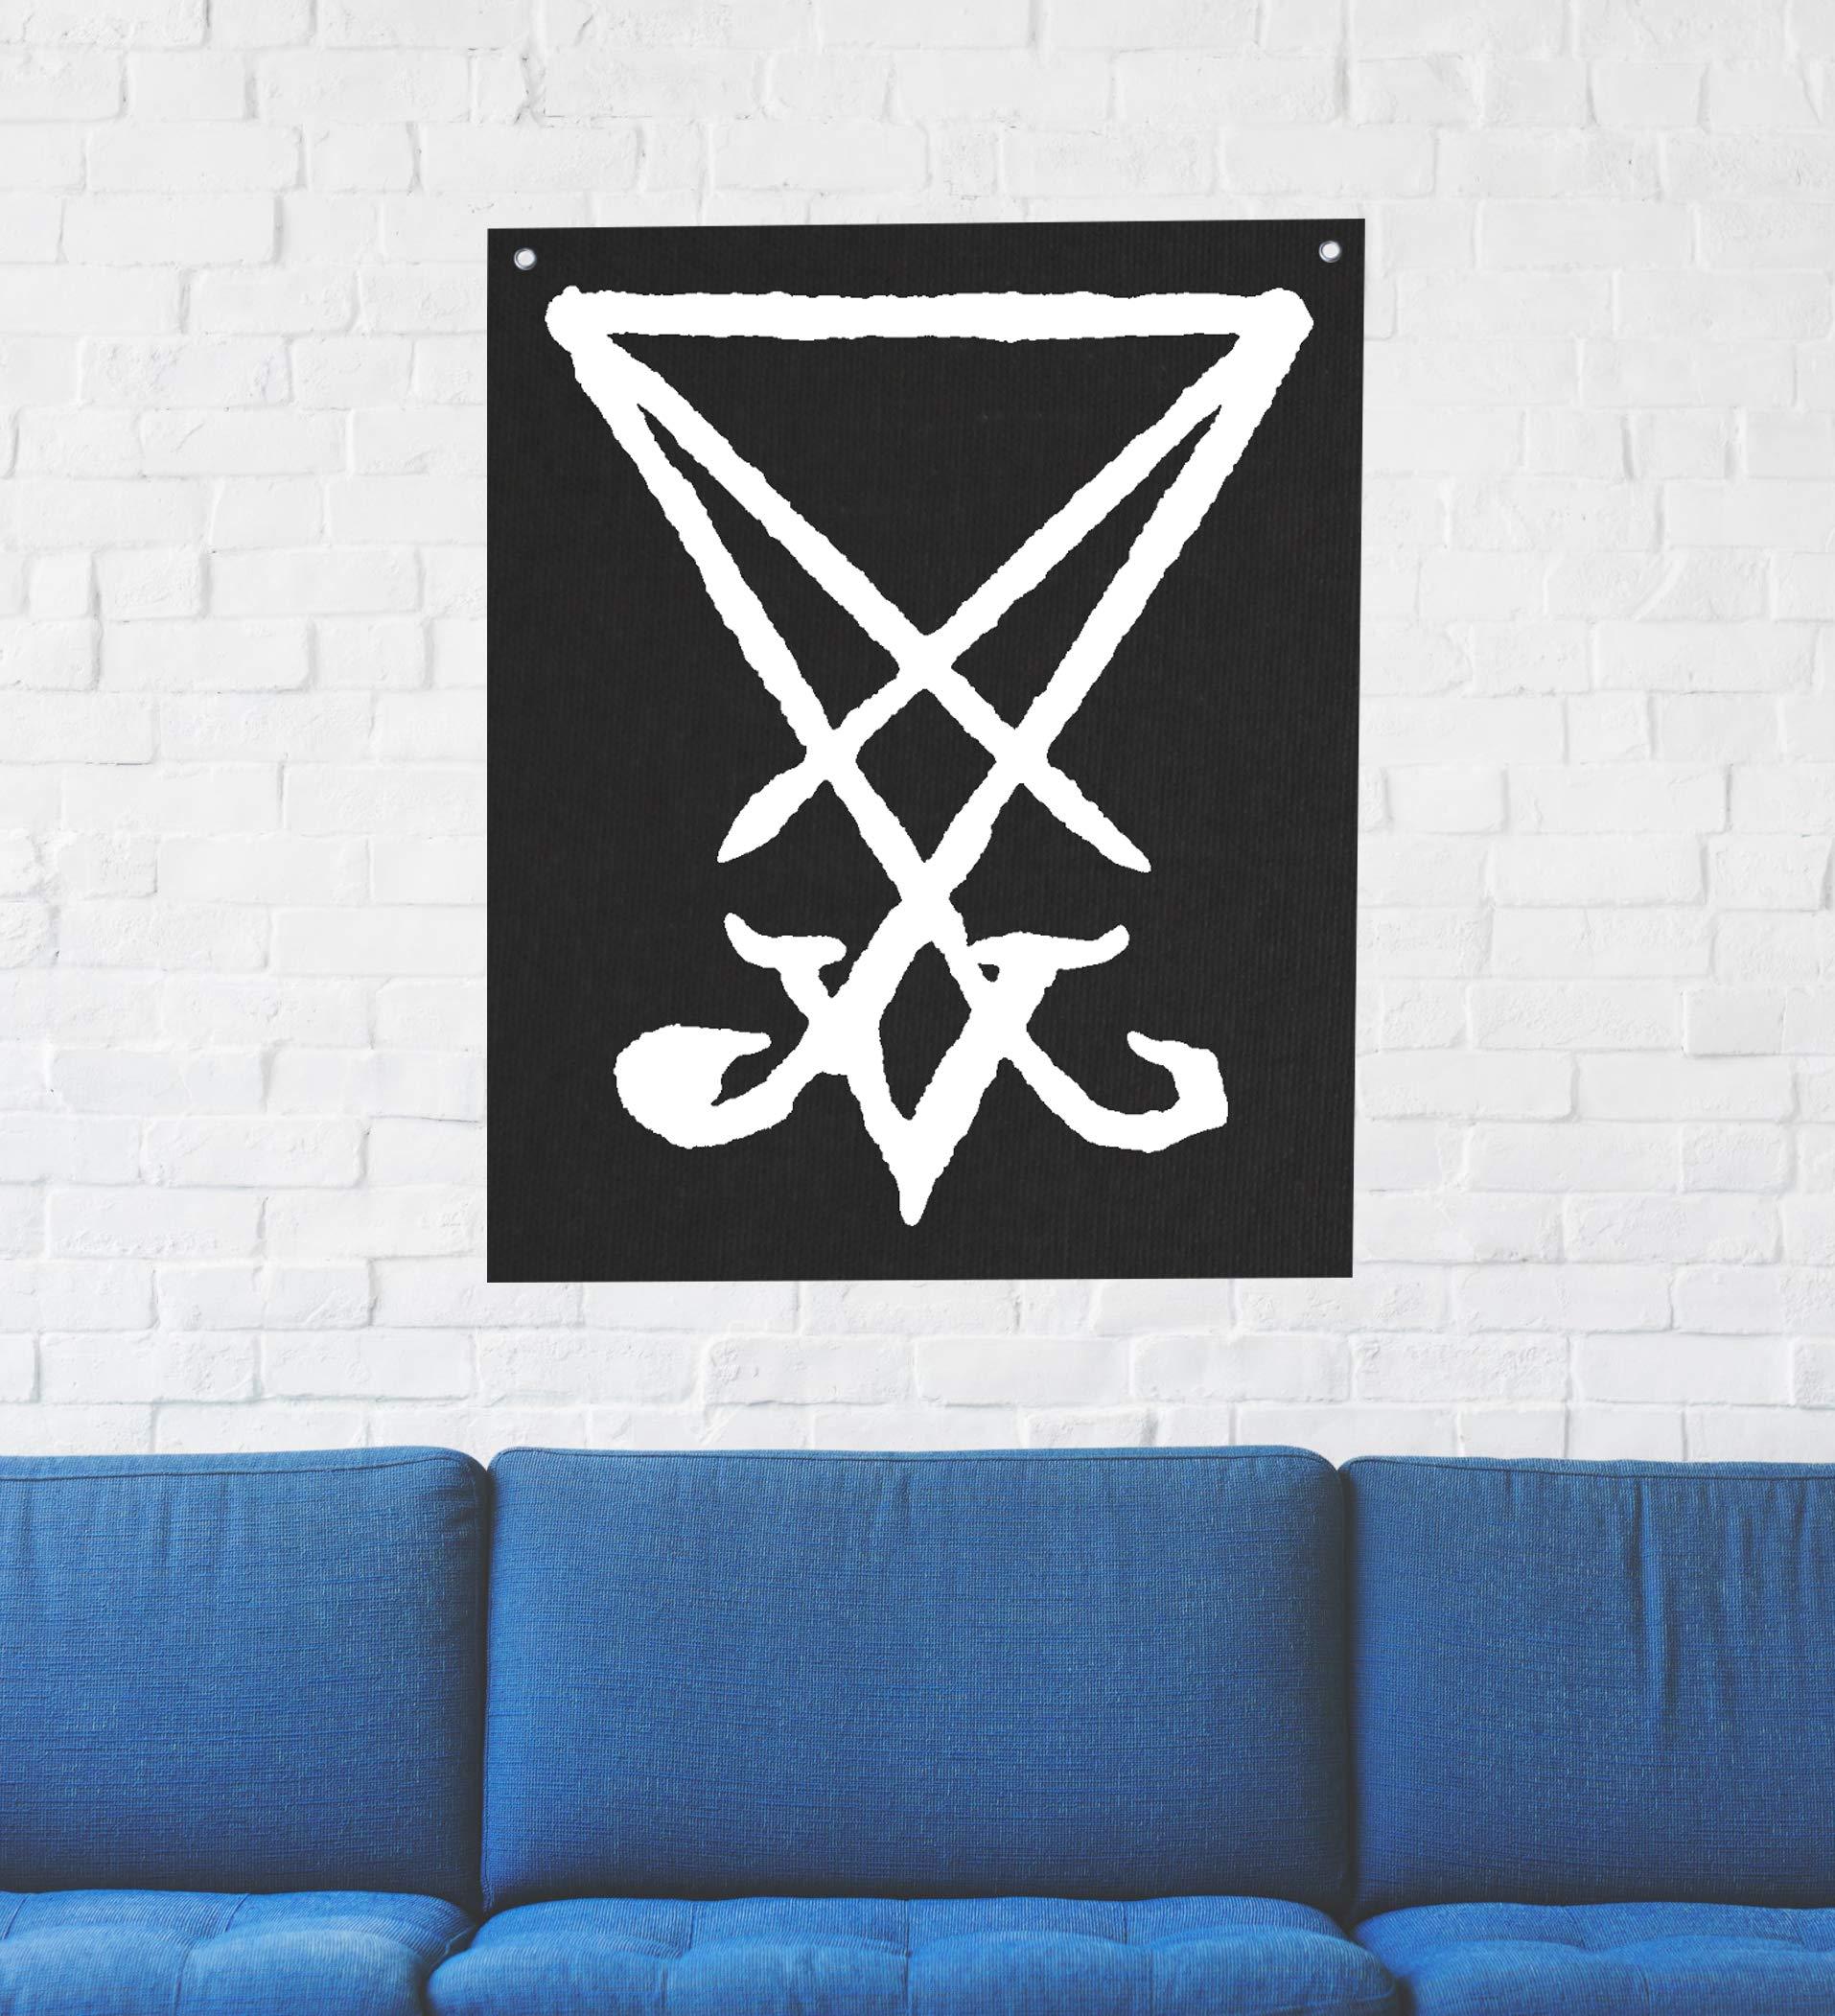 Sigil of Lucifer Wall Tapestry - Goat Skull Pentagram Demonic Devil Dragon Demon Evil Mendes Goat's Head Gothic Metal Occult Punk Satan Satanic Skeleton Voodoo Wicca Baphomet Leviathan Cross Inverted